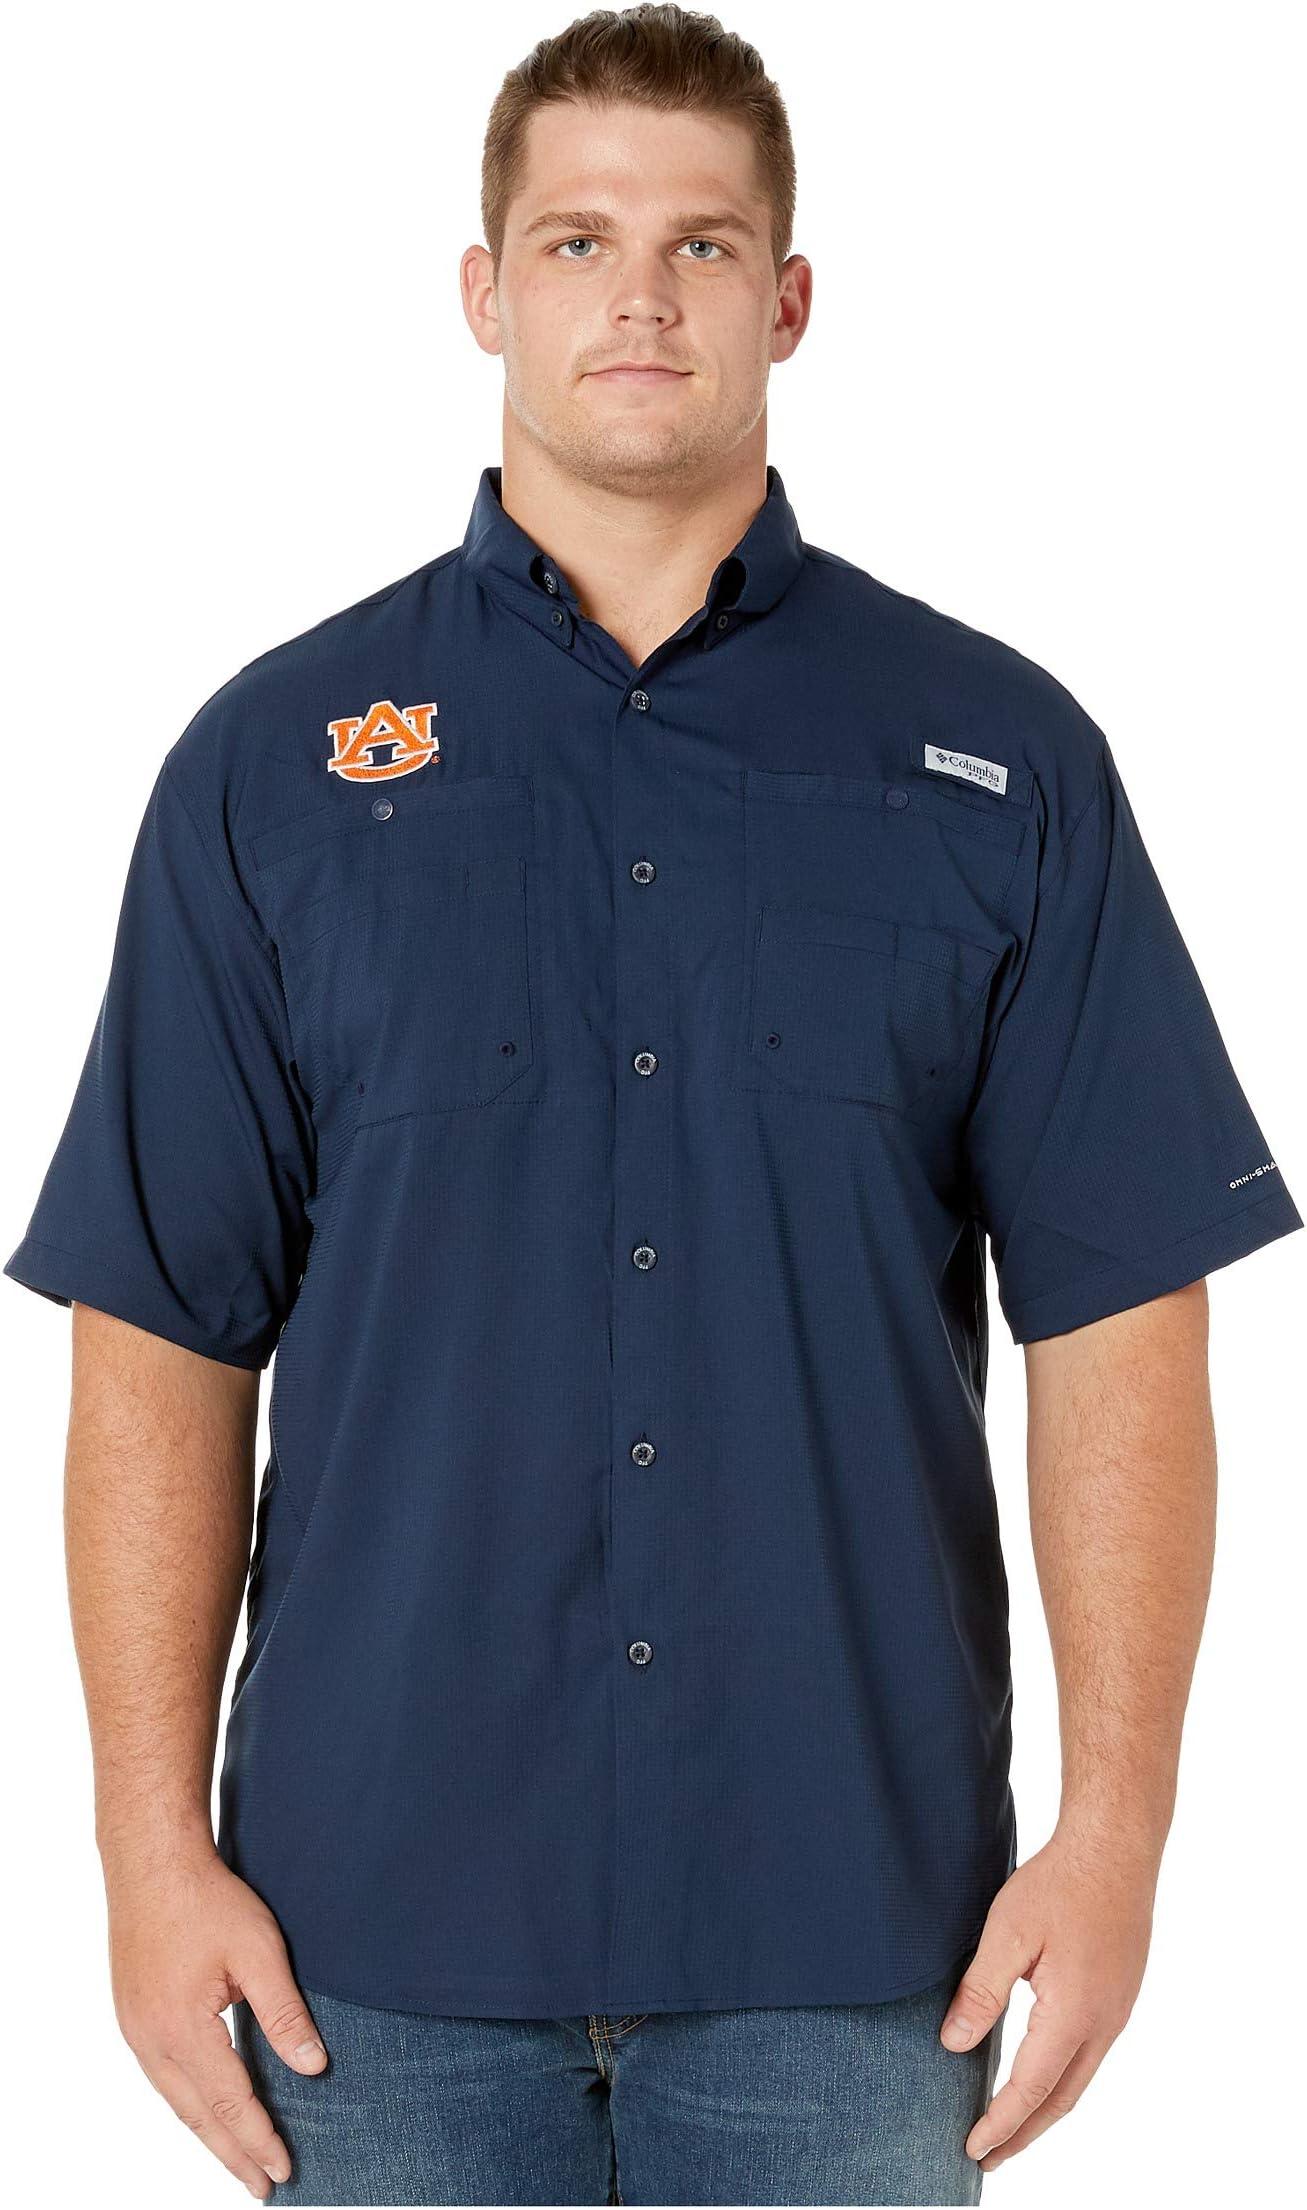 Columbia College Big & Tall Auburn Tigers Collegiate Tamiami�?II Short Sleeve Shirt LDoxQ